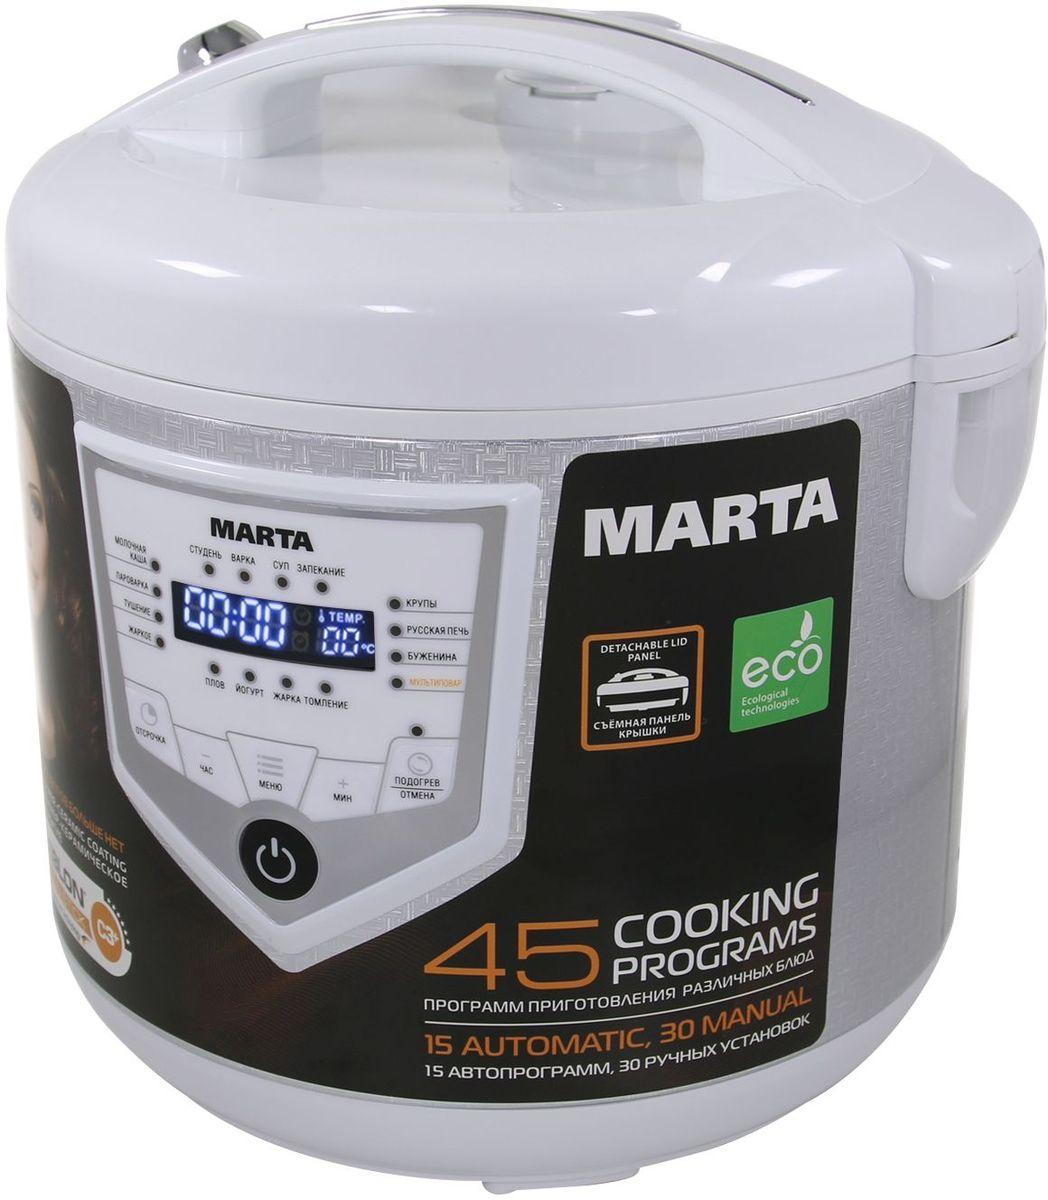 Marta MT-4308, White мультиварка